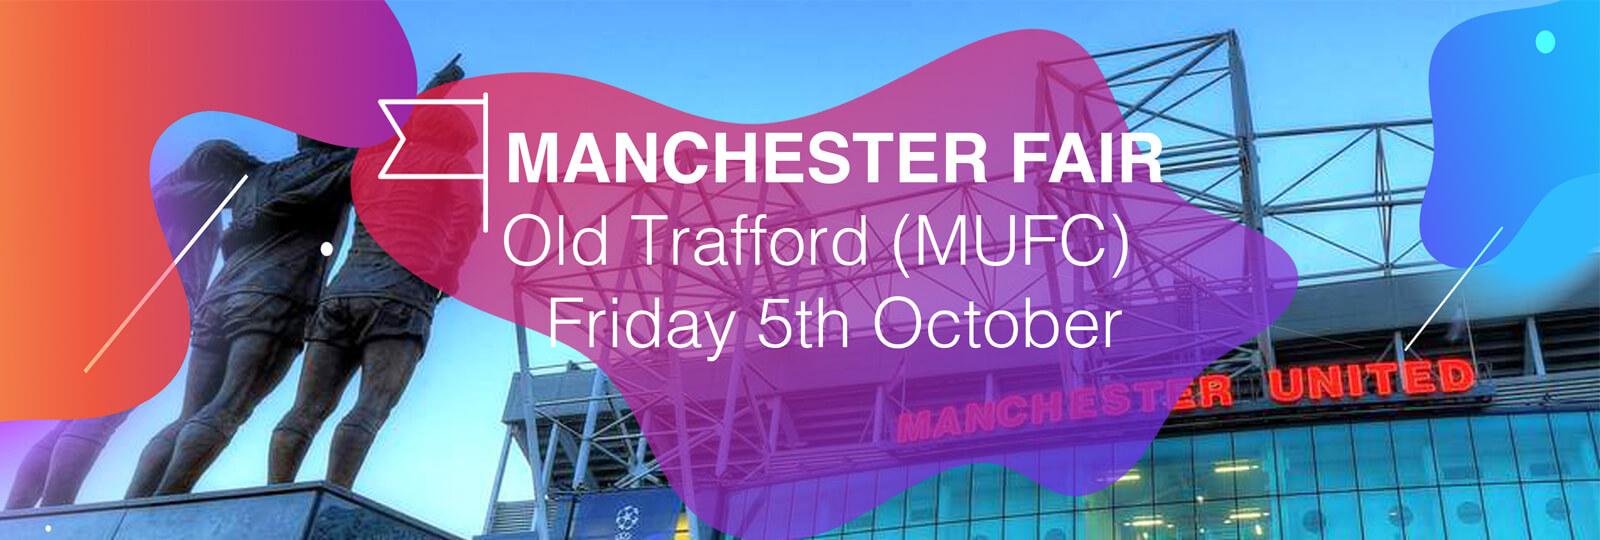 Manchester Fair